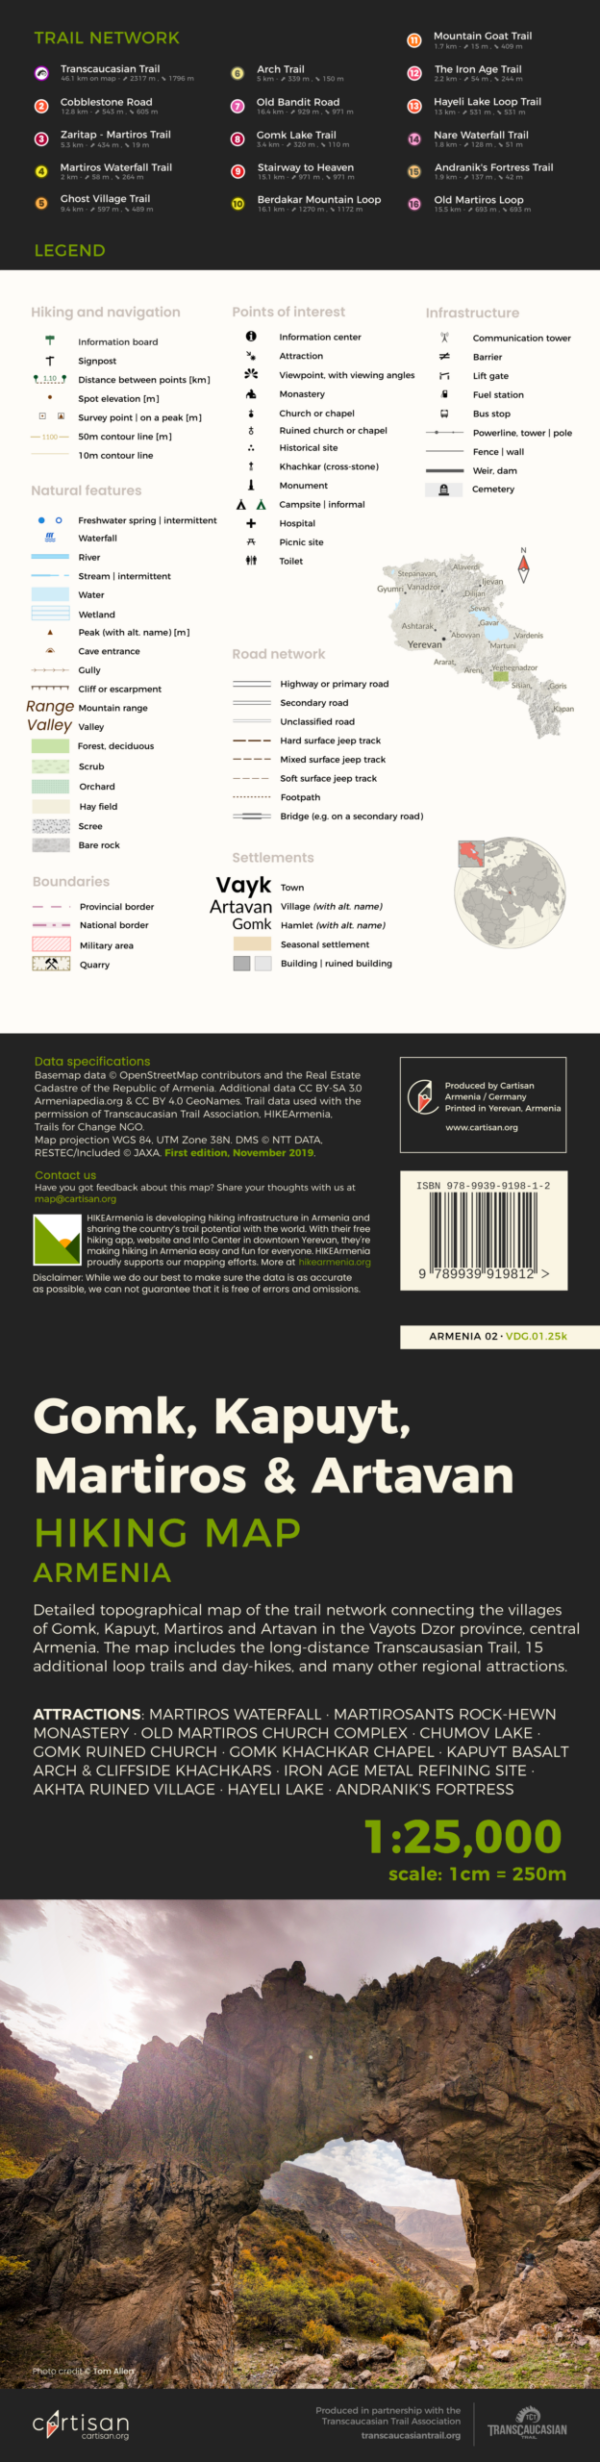 Gomk-Kapuyt-Martiros-Artavan-Topo-Map-Extended-Cover